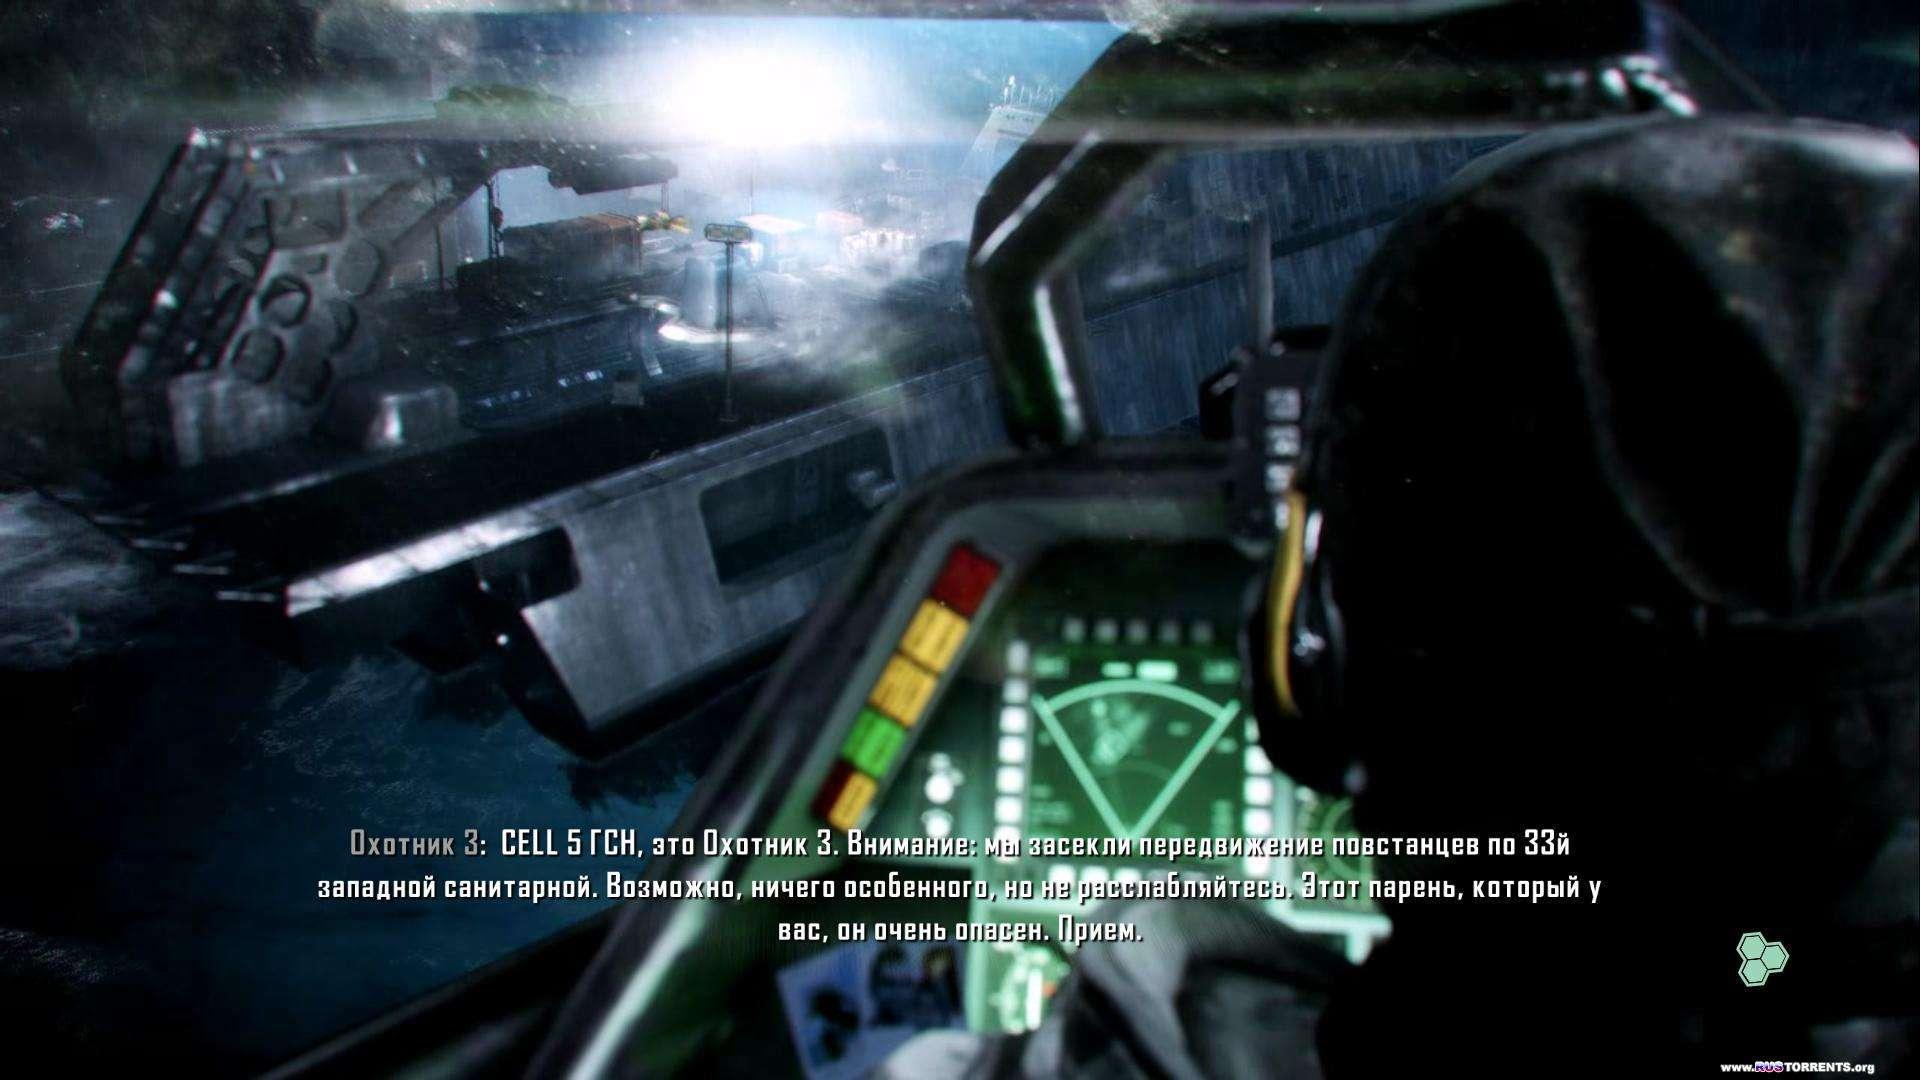 Crysis 3.Digital Deluxe.v 1.0.0.1 (EA Russia) (RUS) (3xDVD5) [Repack] от Fenixx